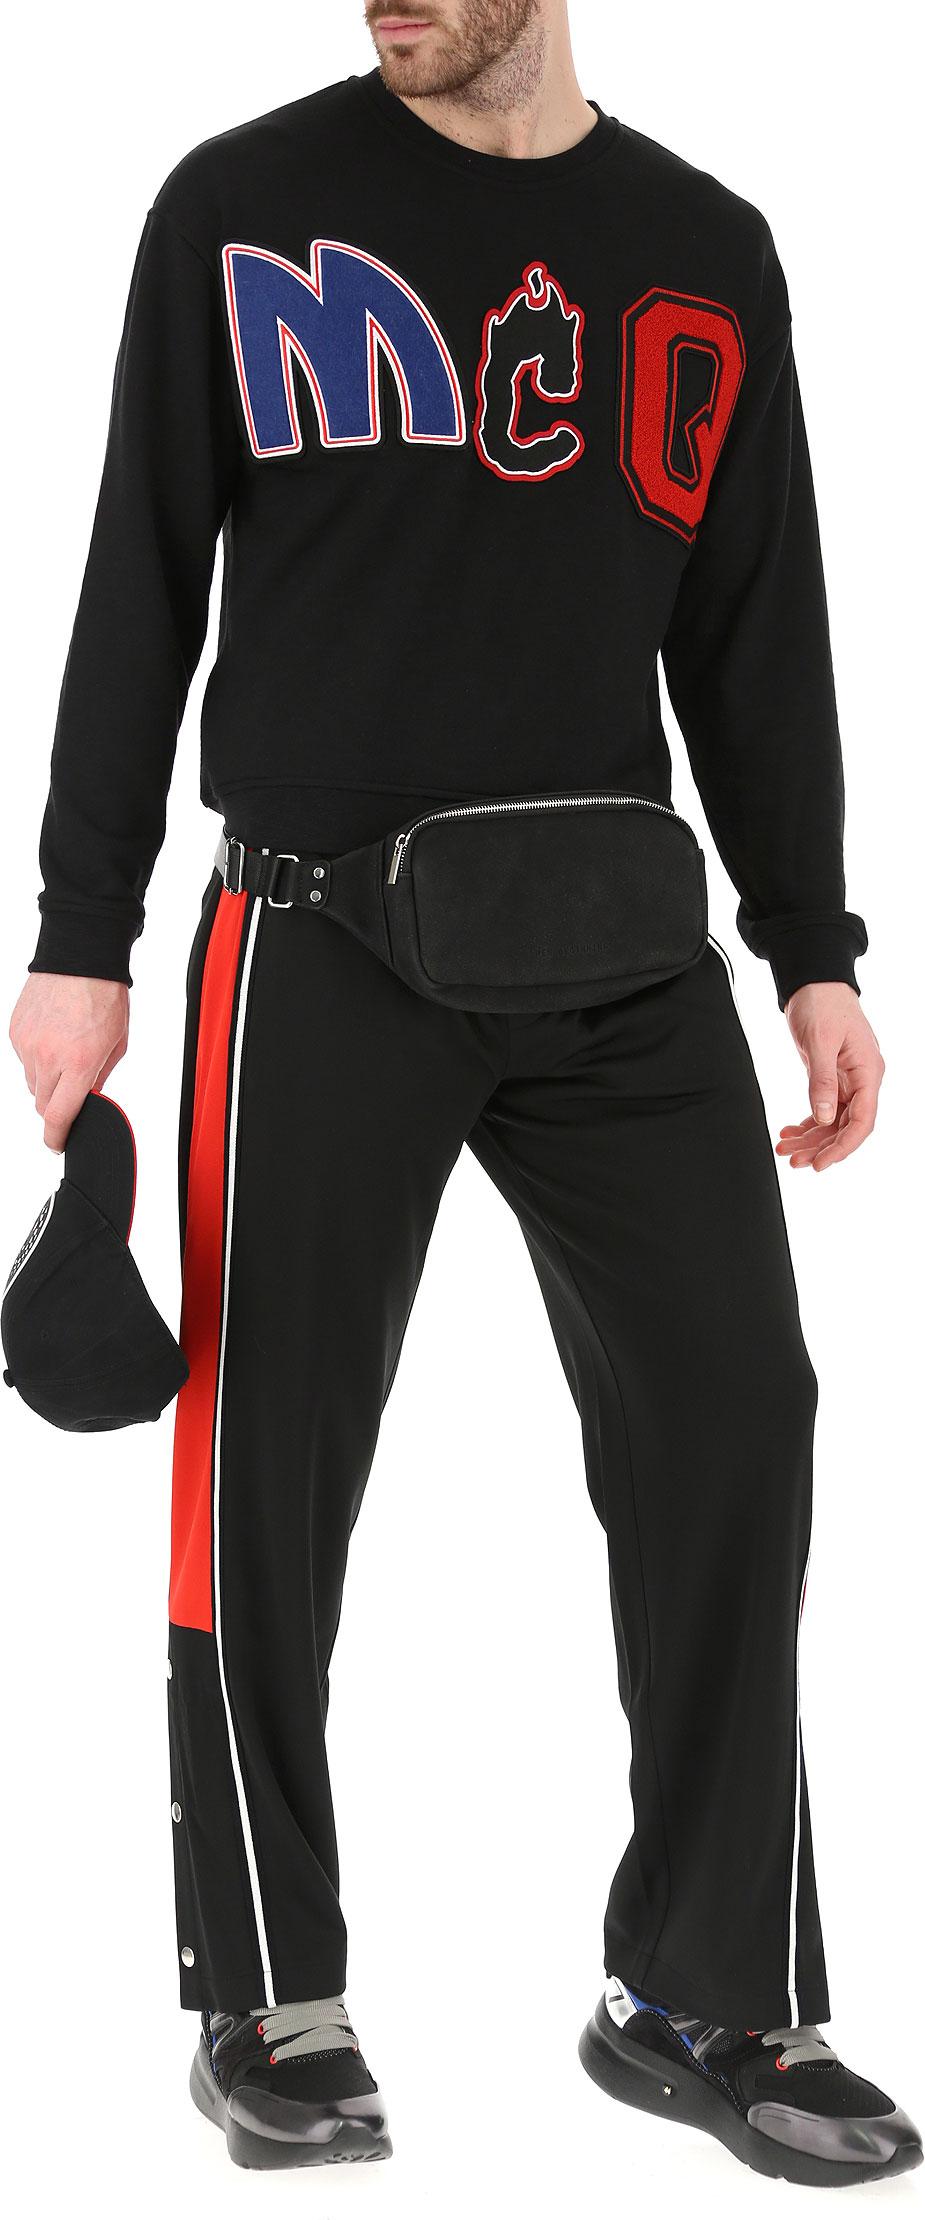 b523a48bbdf Mens Clothing Alexander McQueen McQ